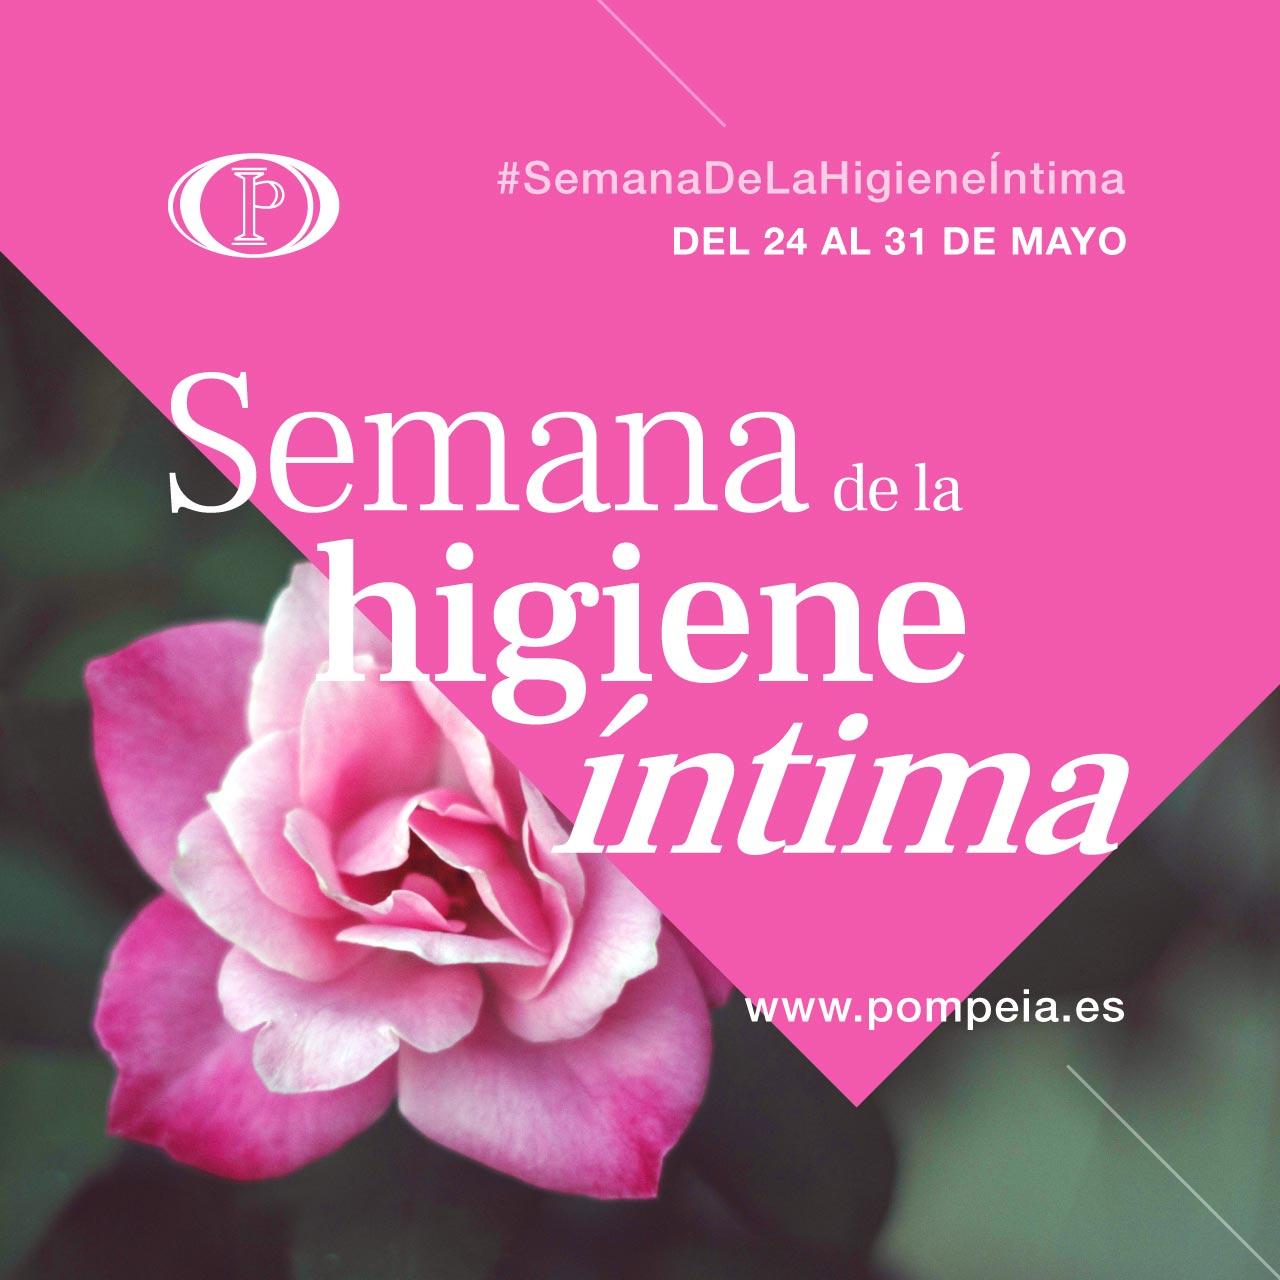 Celebramos el Día Internacional de la Higiene Menstrual en la Semana de la Higiene Íntima de Pompeia Life